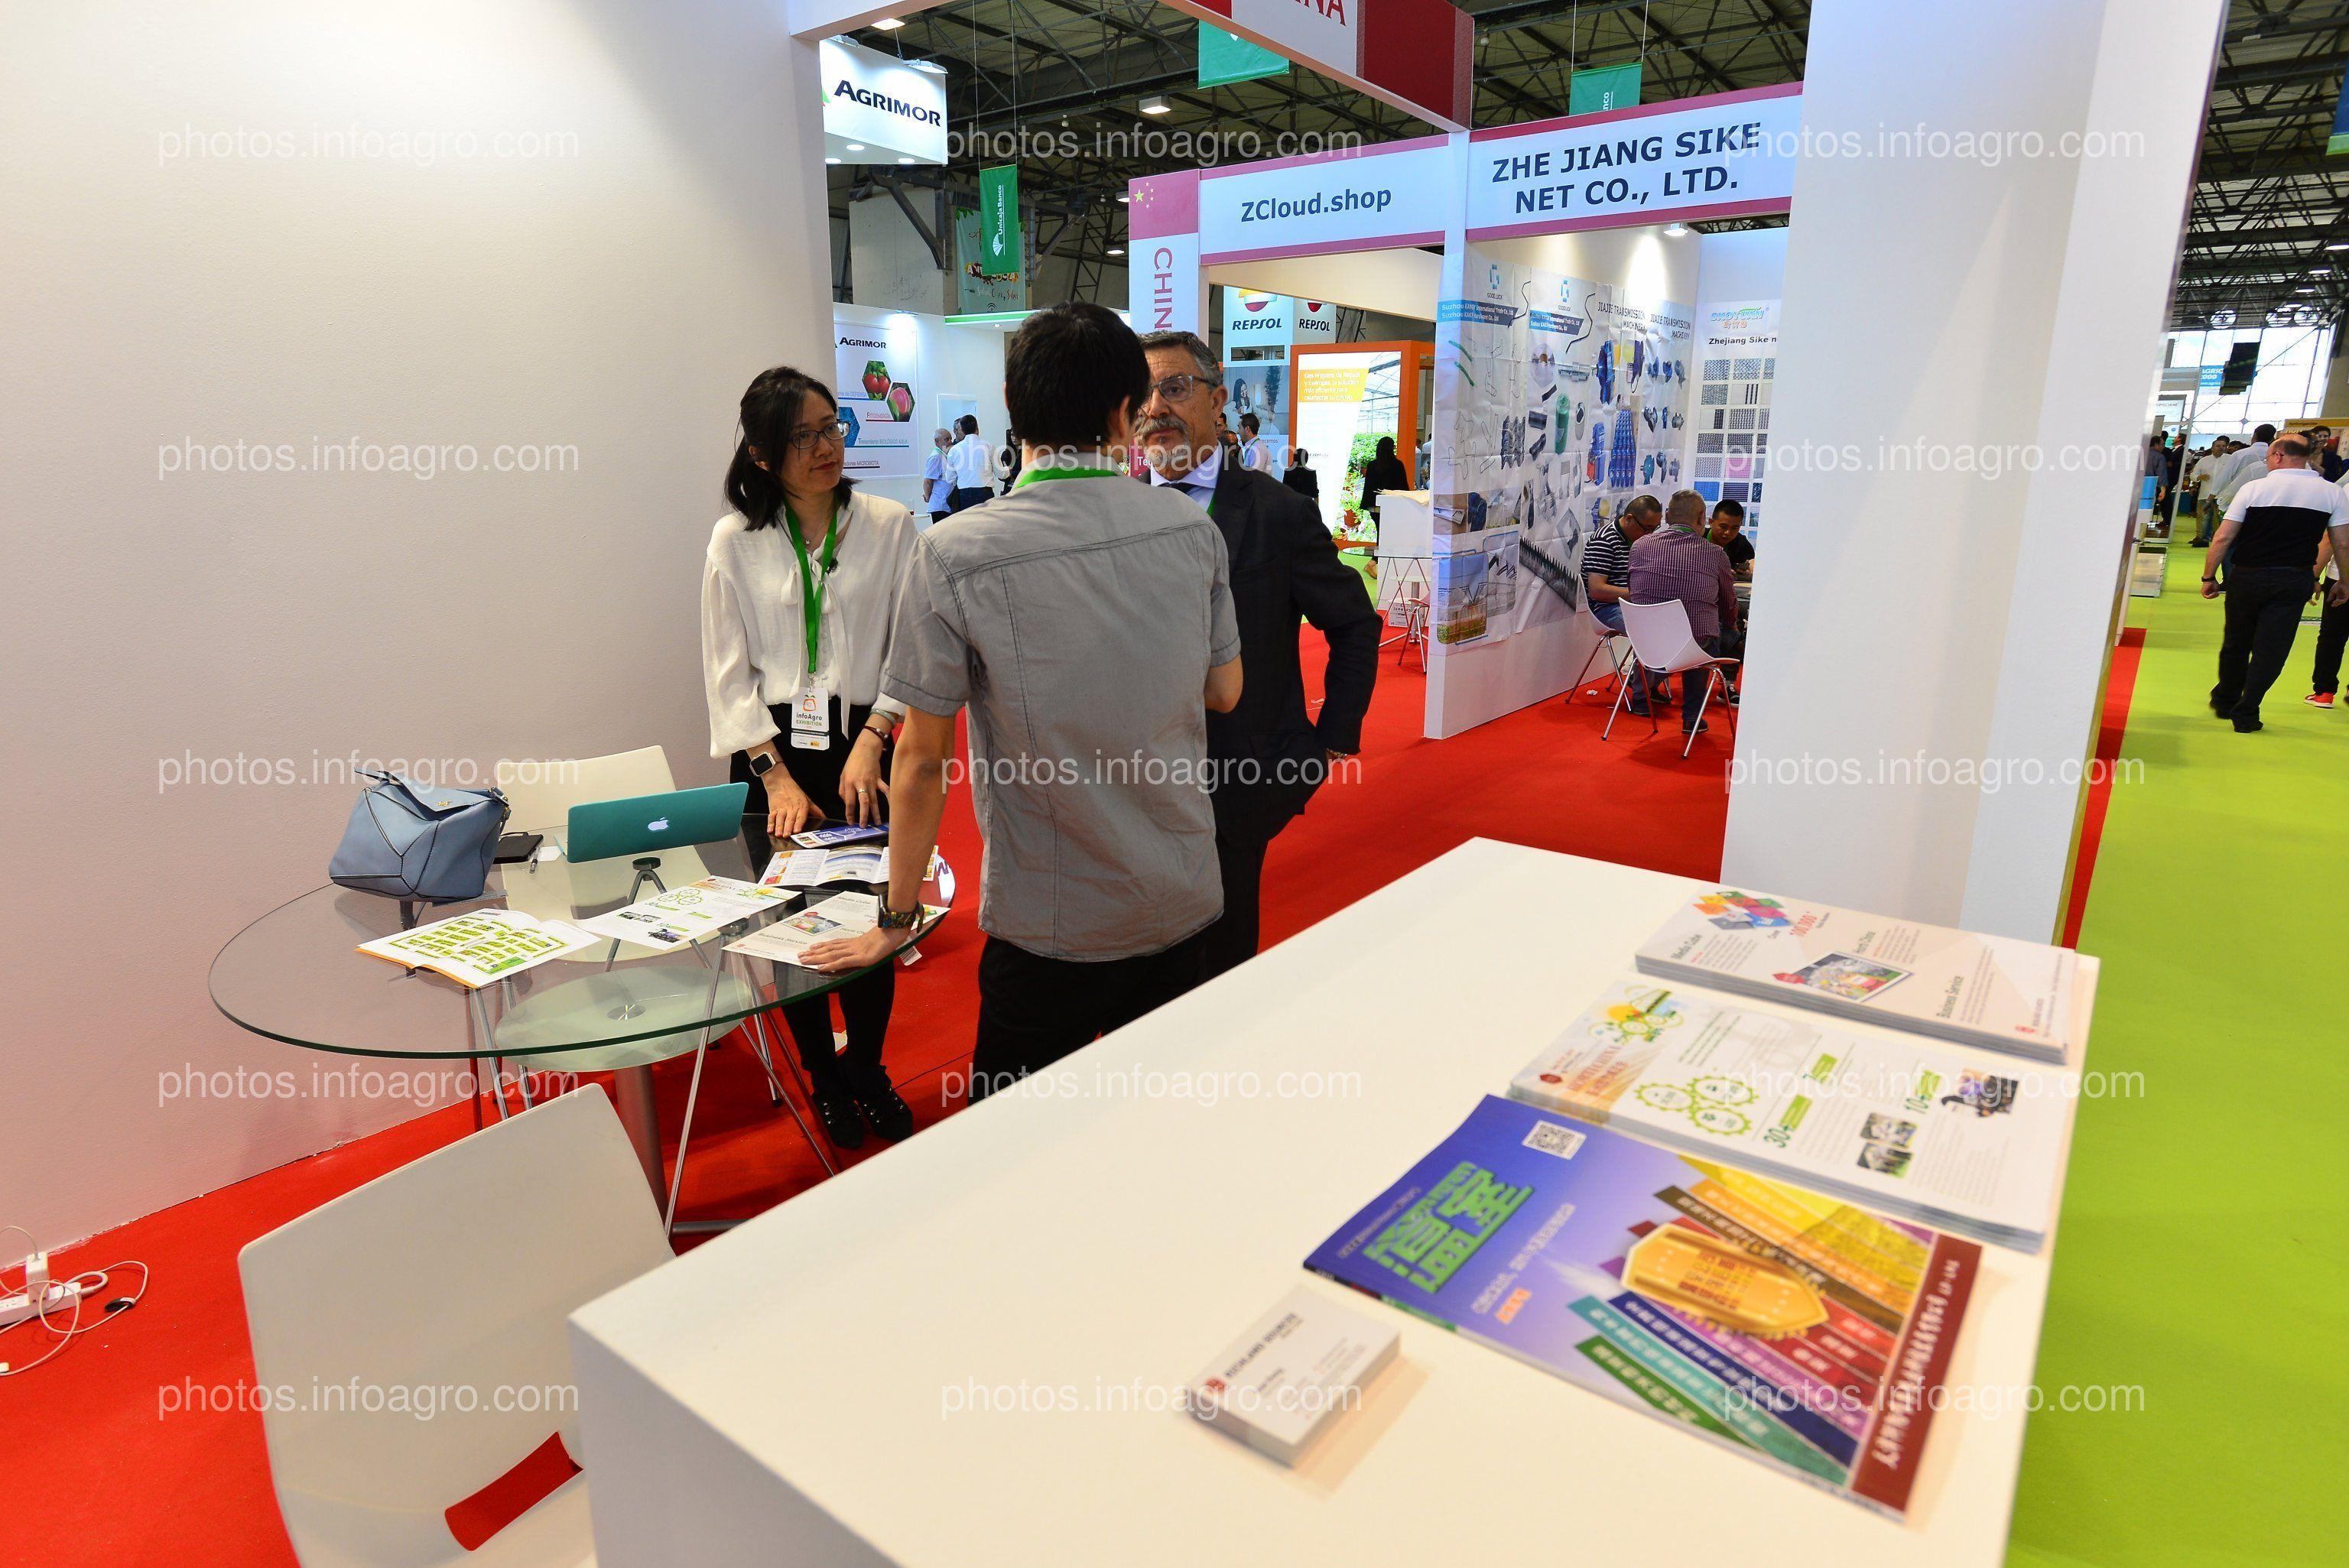 China Pavilion - Stand Infoagro Exhibitione